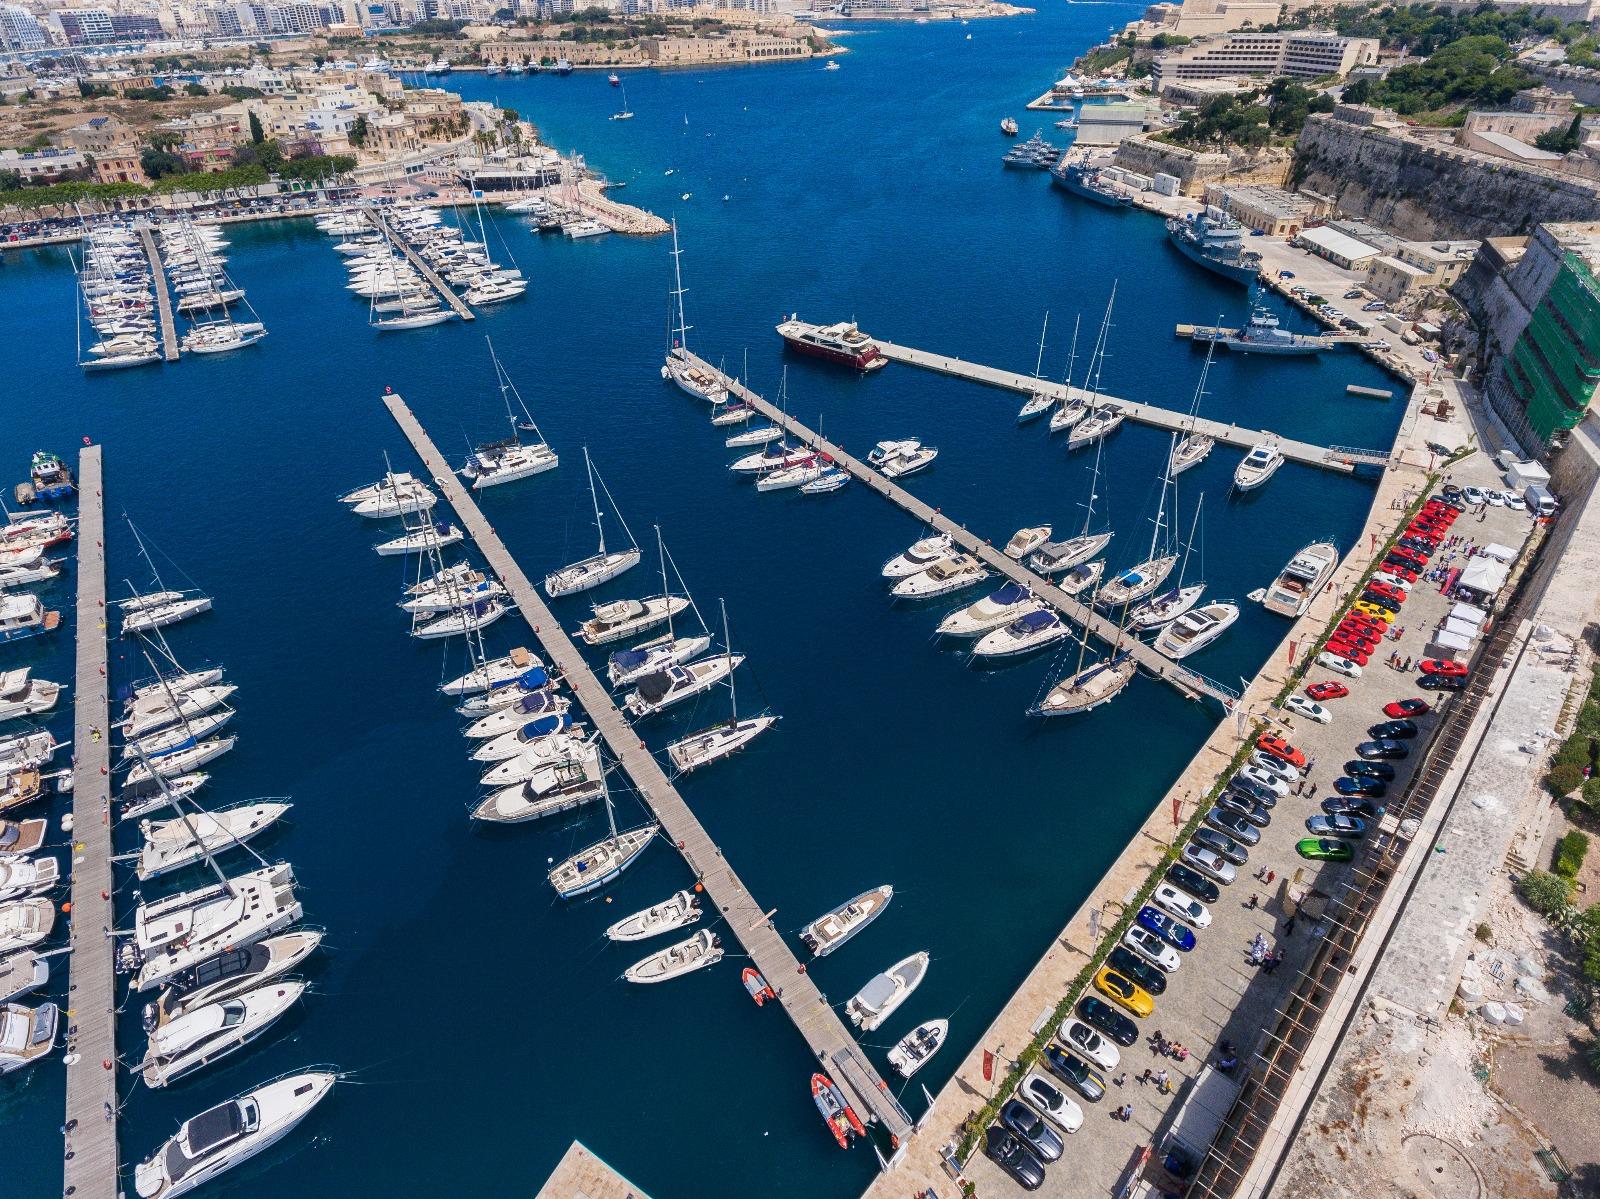 Cars Unlimited & Coffee at the Marina di Valletta